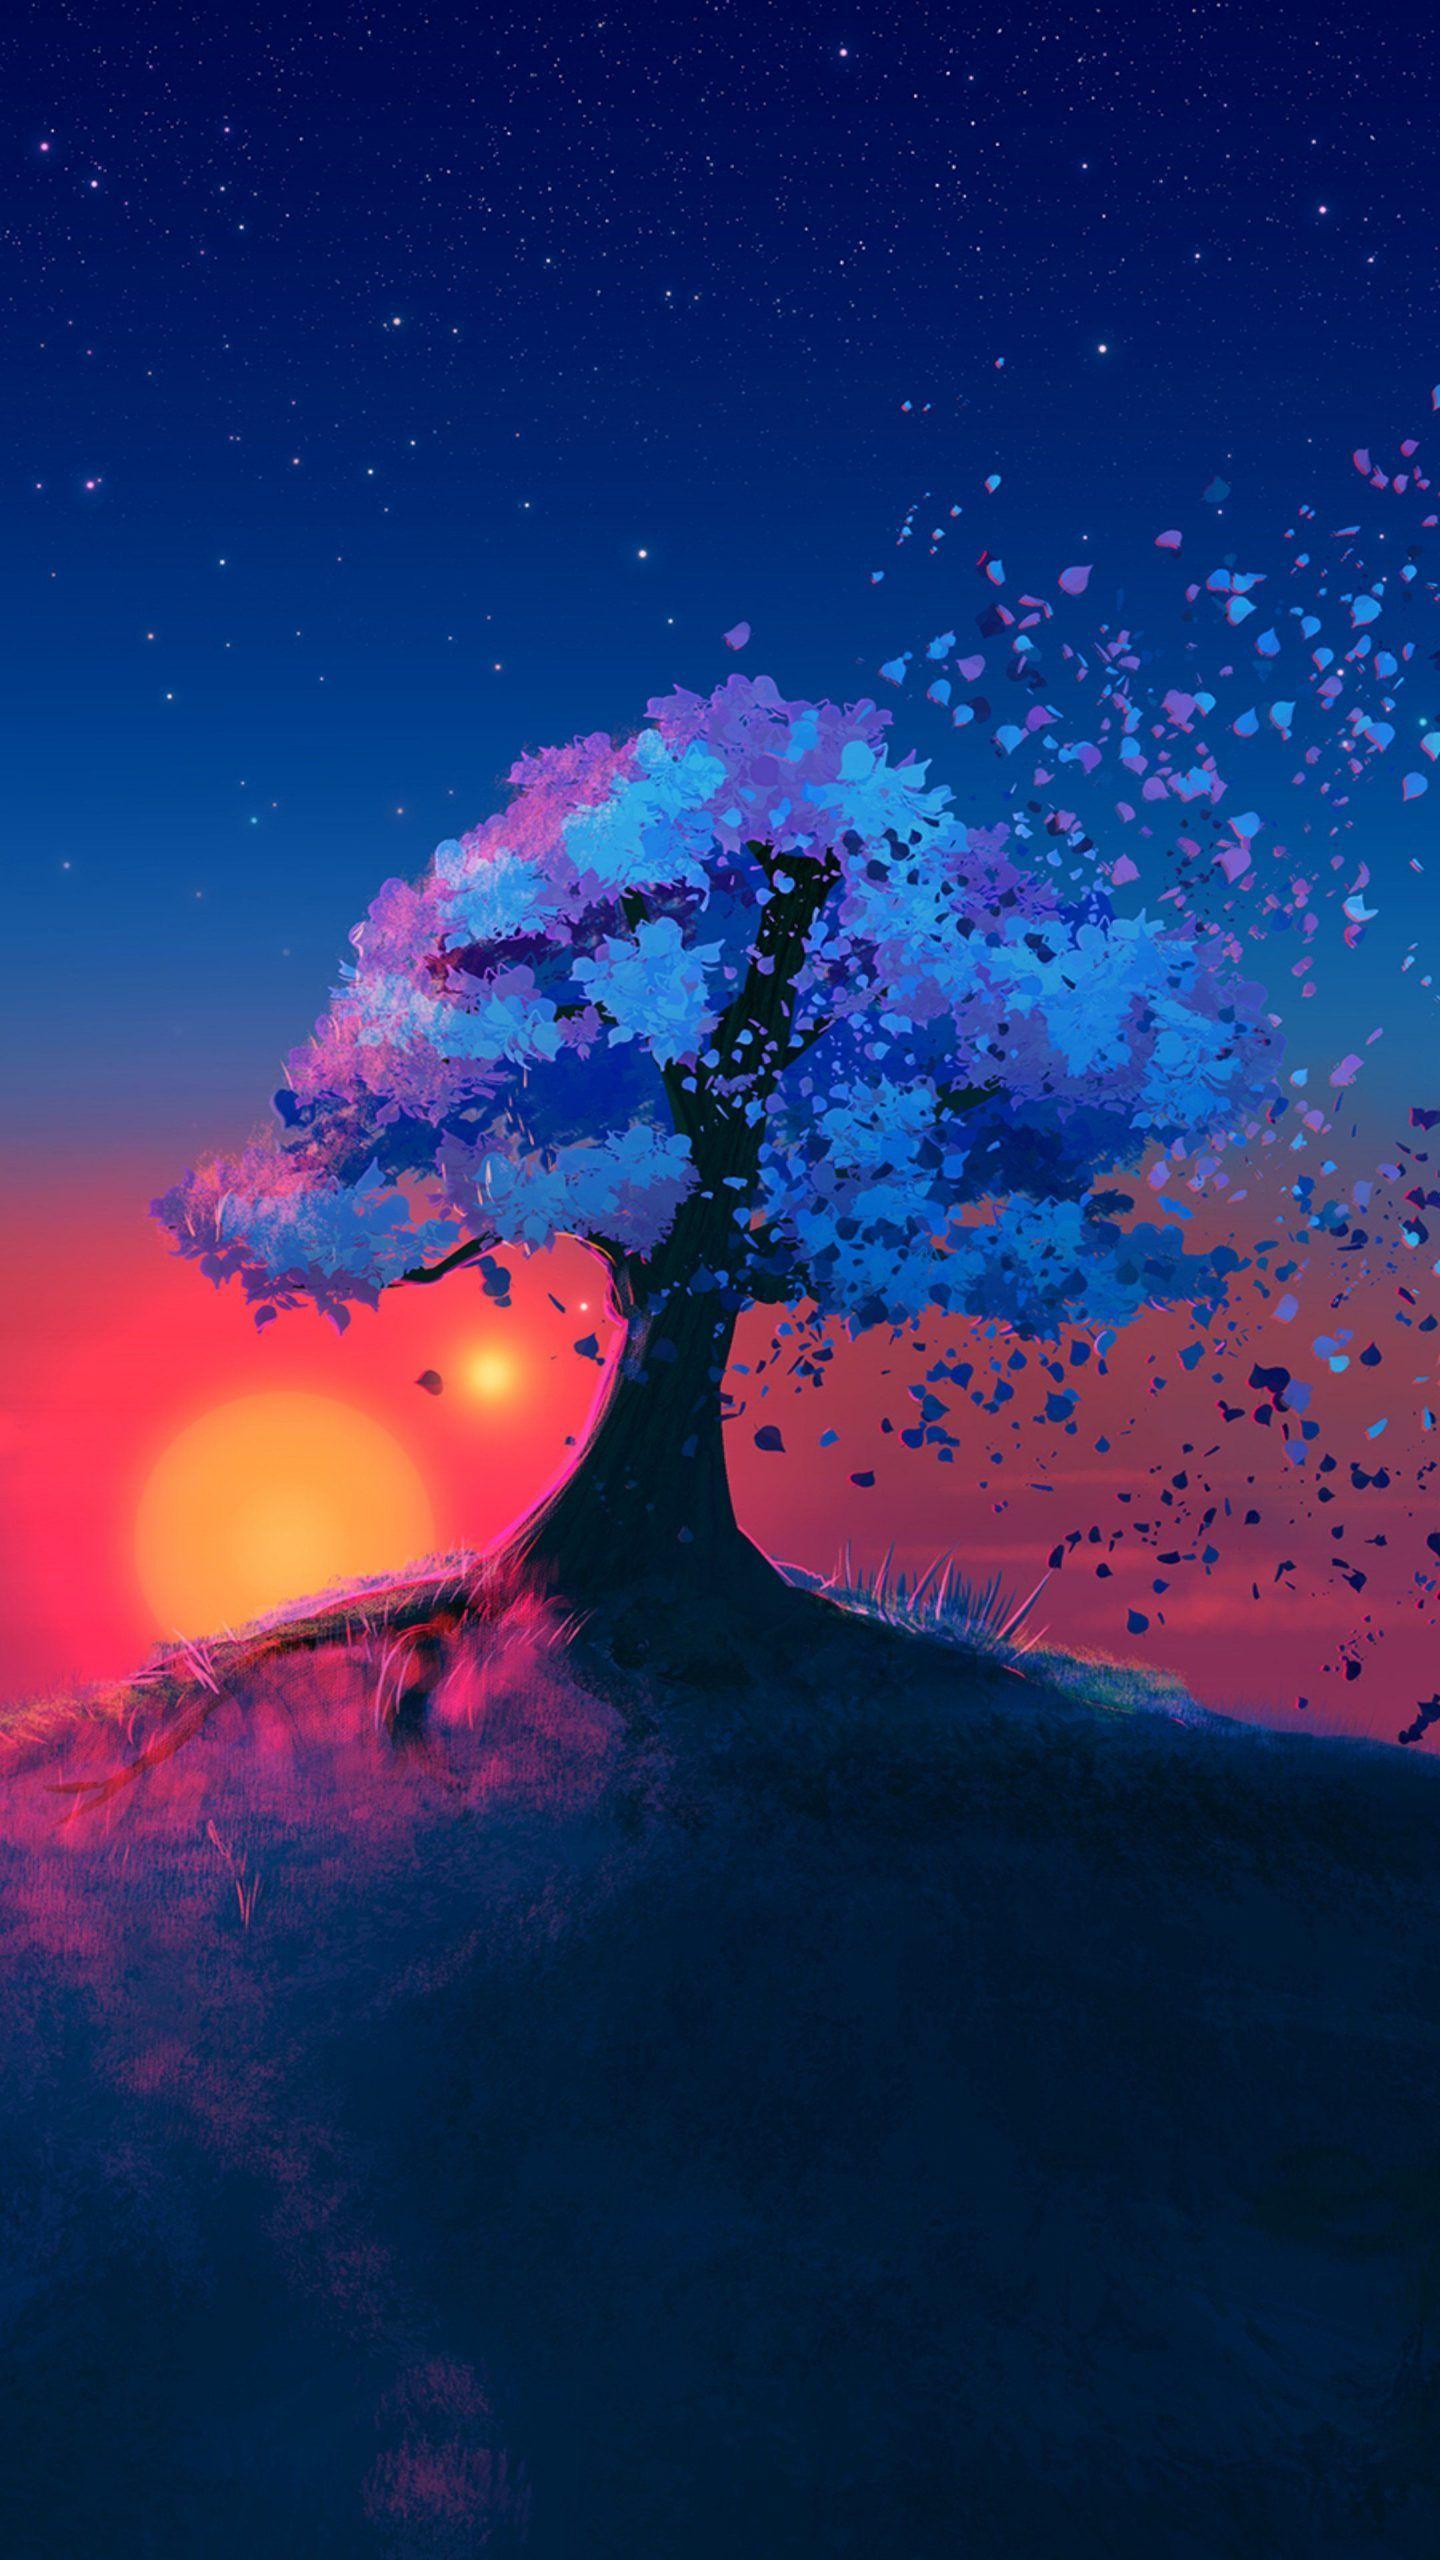 Alone Tree MobileWallpaper Art MobileWallpaper Tree in